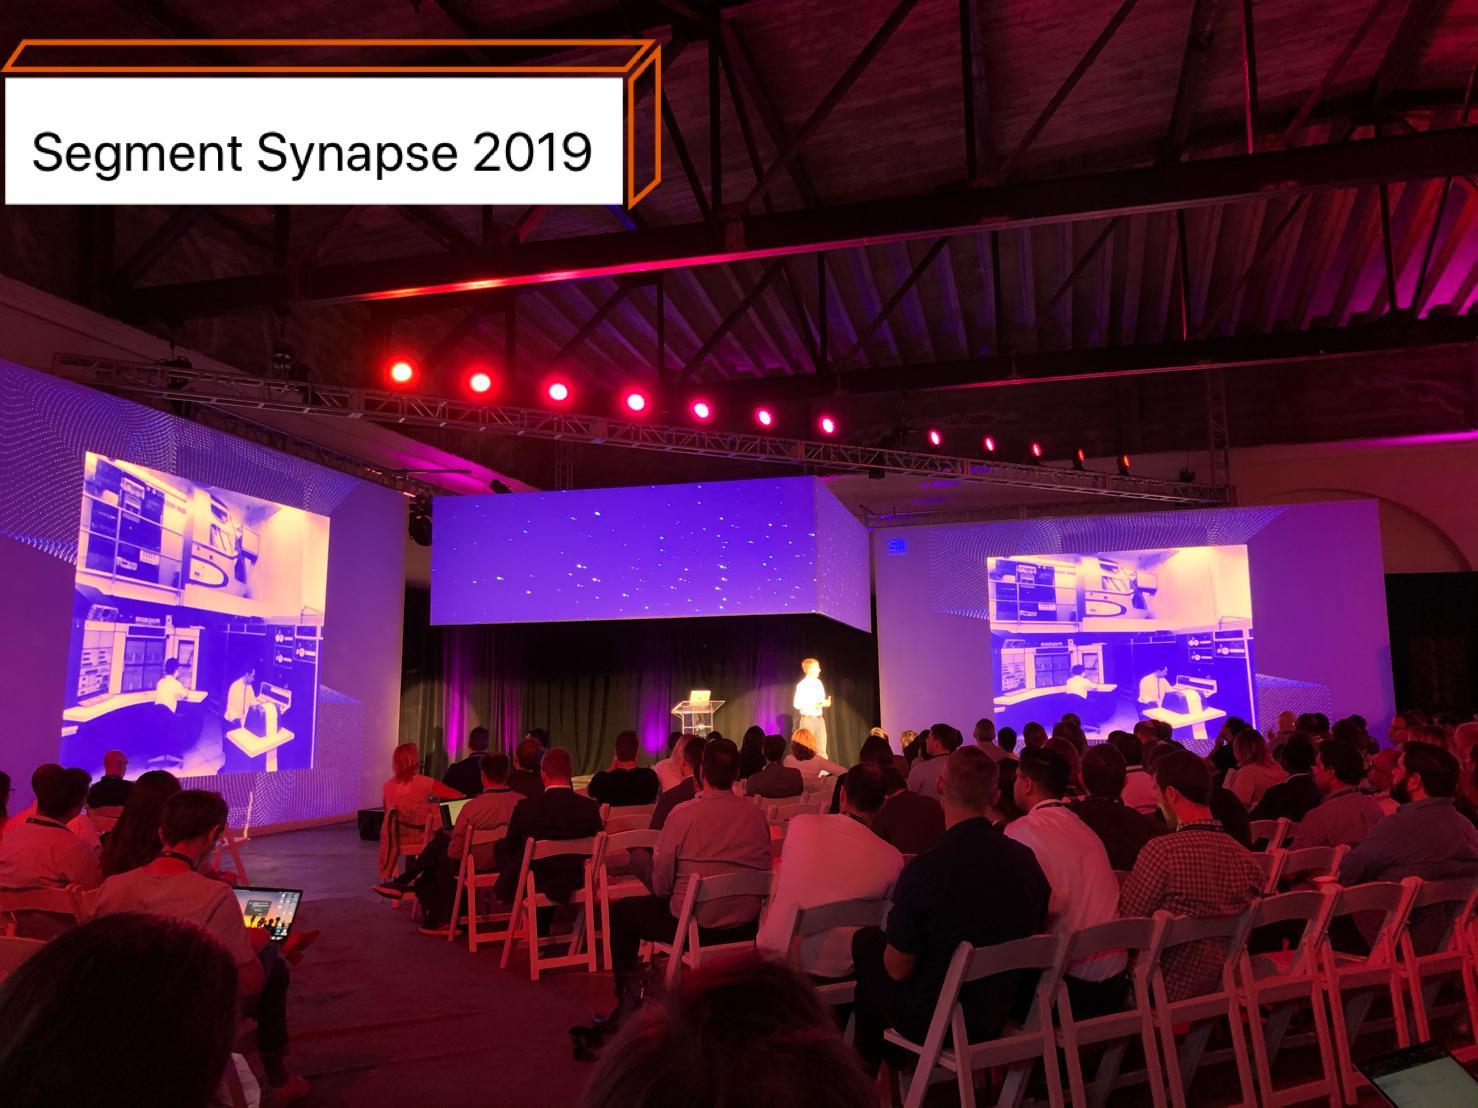 Segment Synapse 2019